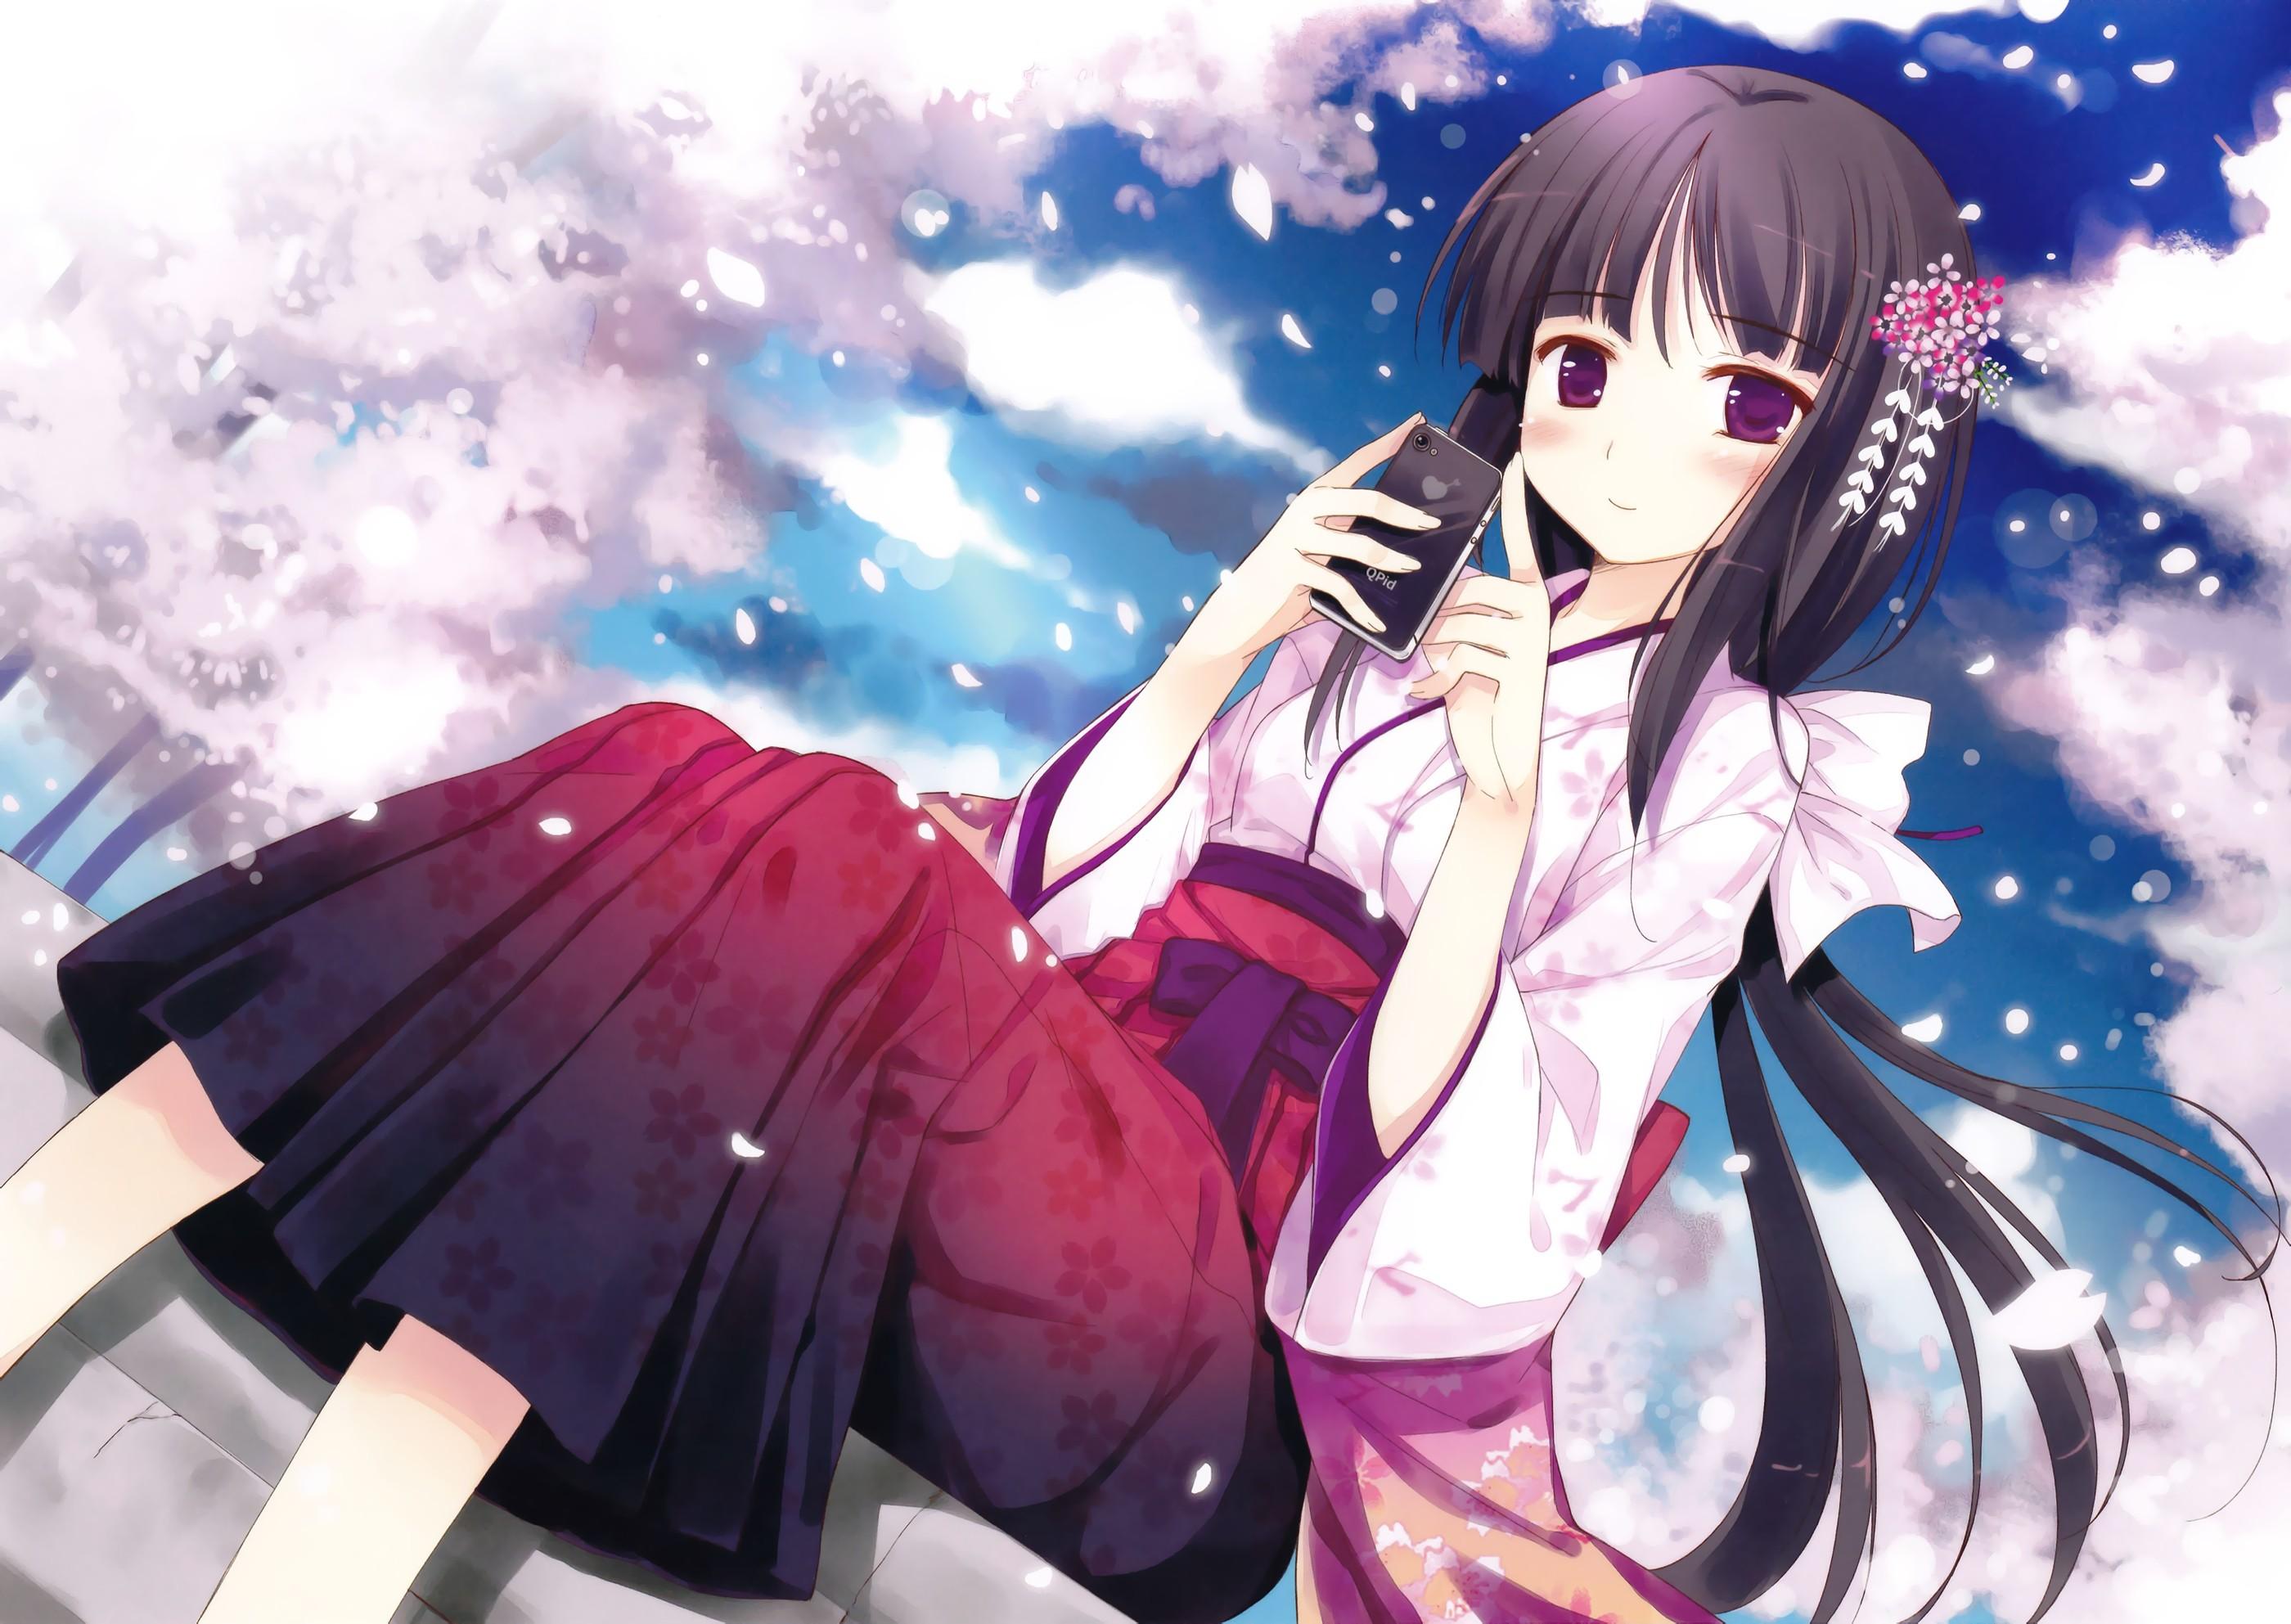 Cherry Blossoms Ipod Long Hair Purple Eyes Yukata Japanese